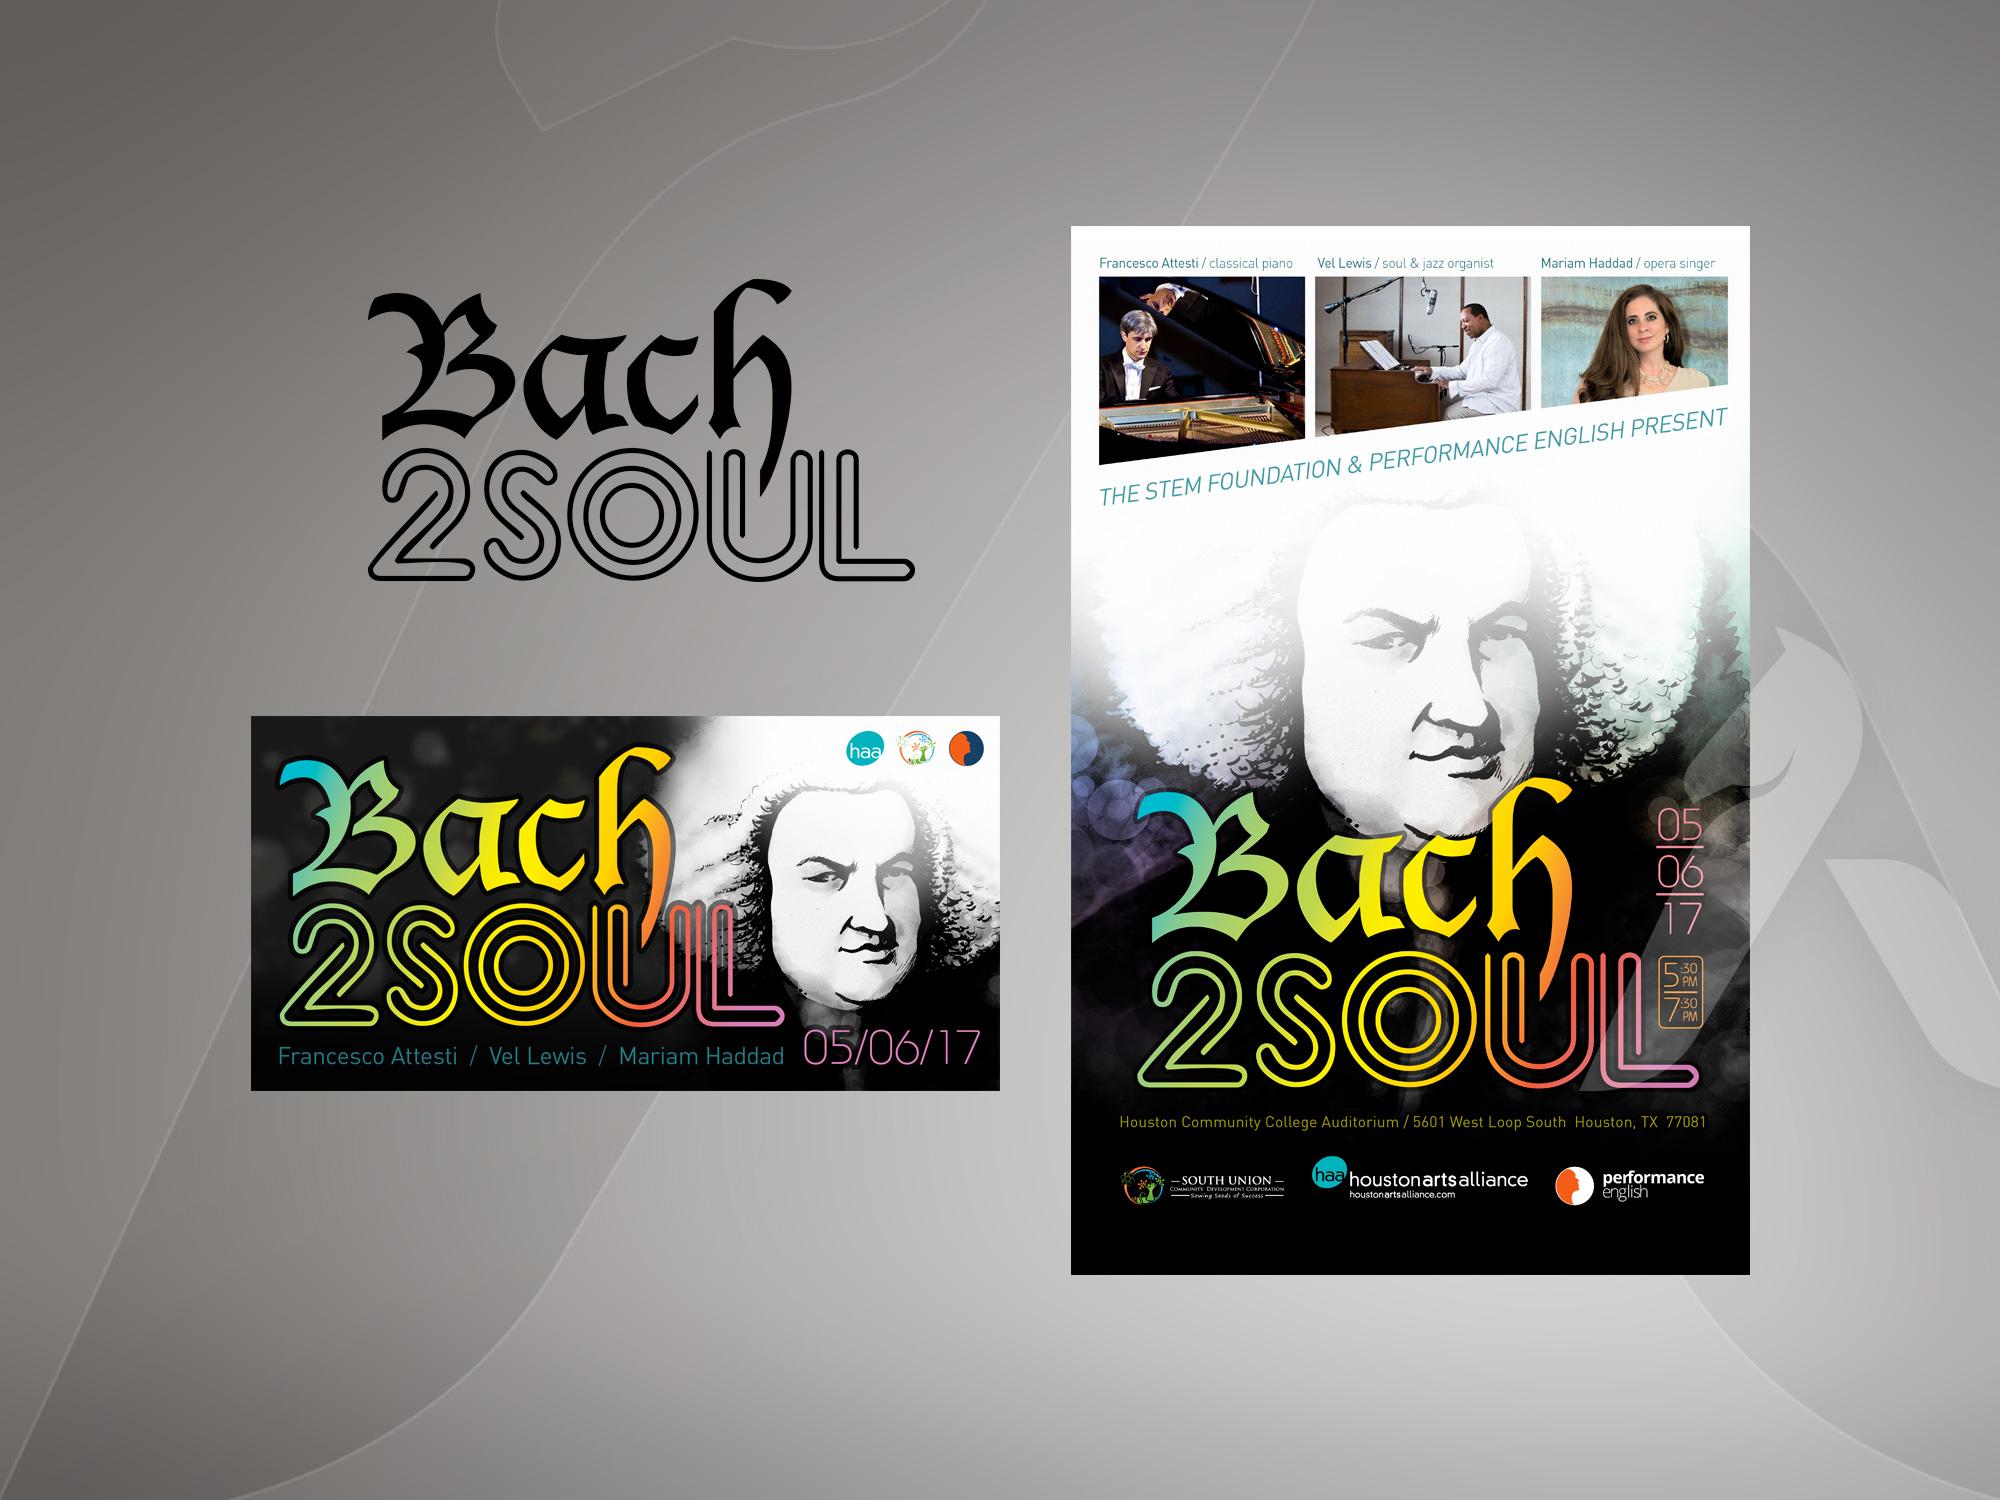 Bach2Soul design & illustration by Hakubashi